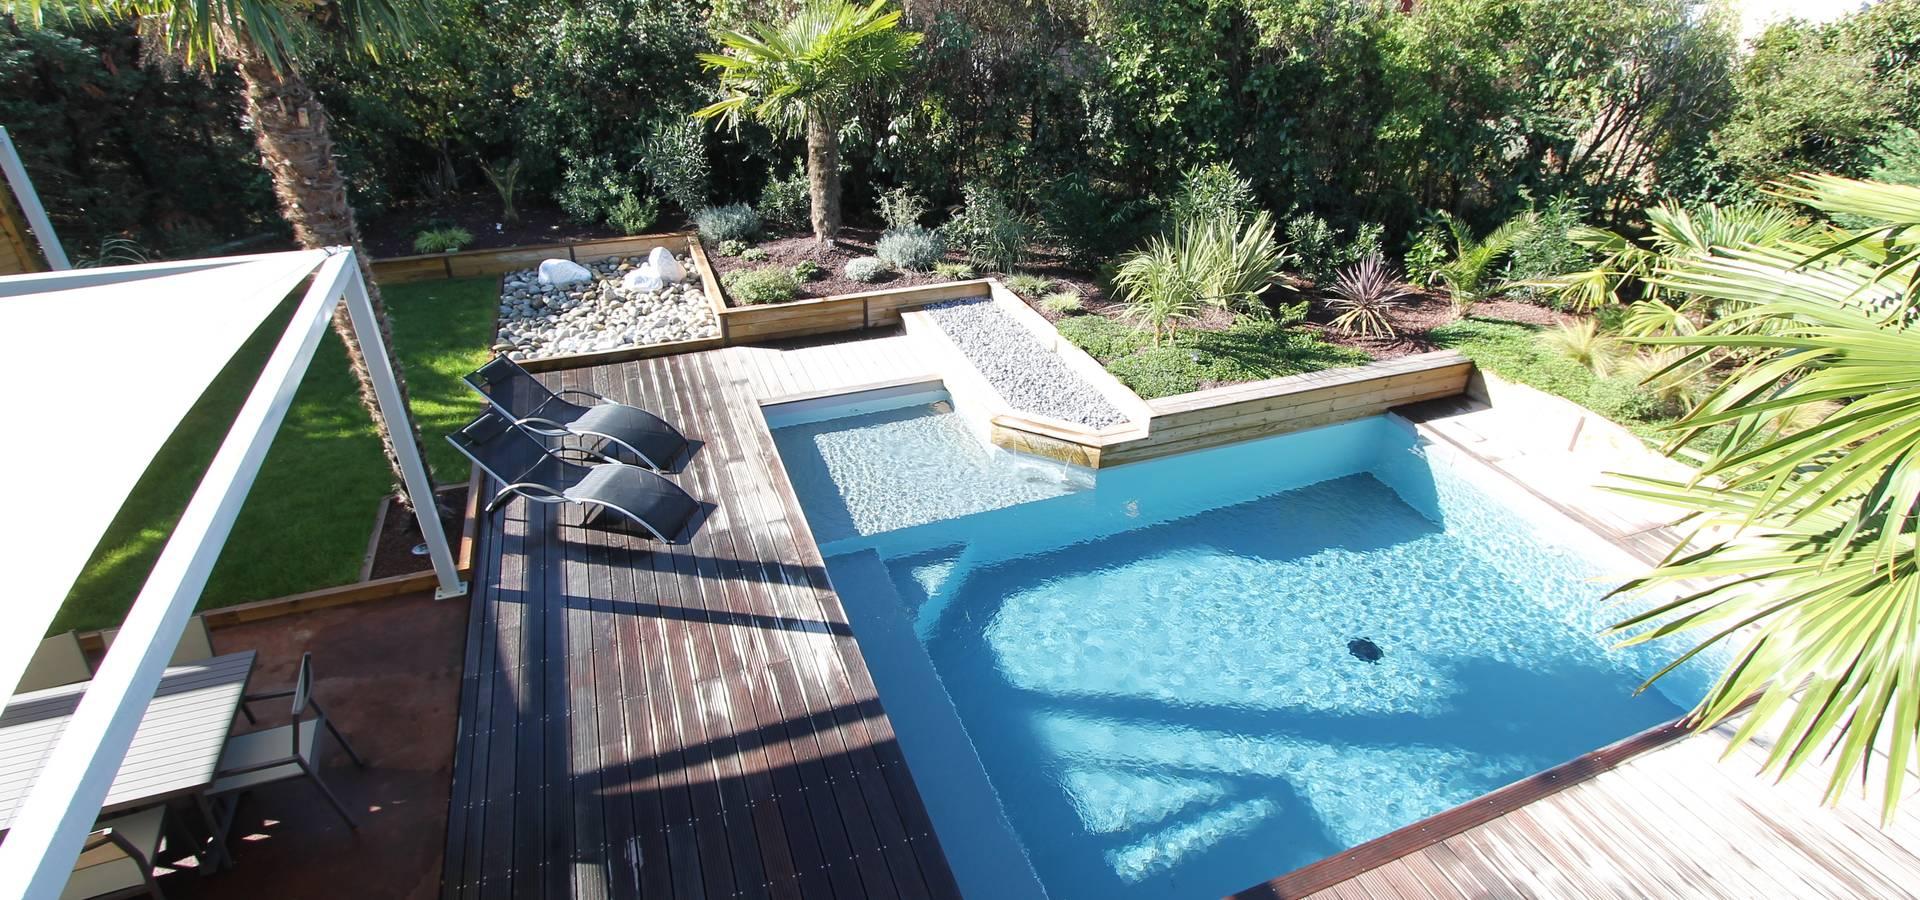 cr ation d 39 un jardin avec piscine por bureau d 39 etudes jardins kael homify. Black Bedroom Furniture Sets. Home Design Ideas